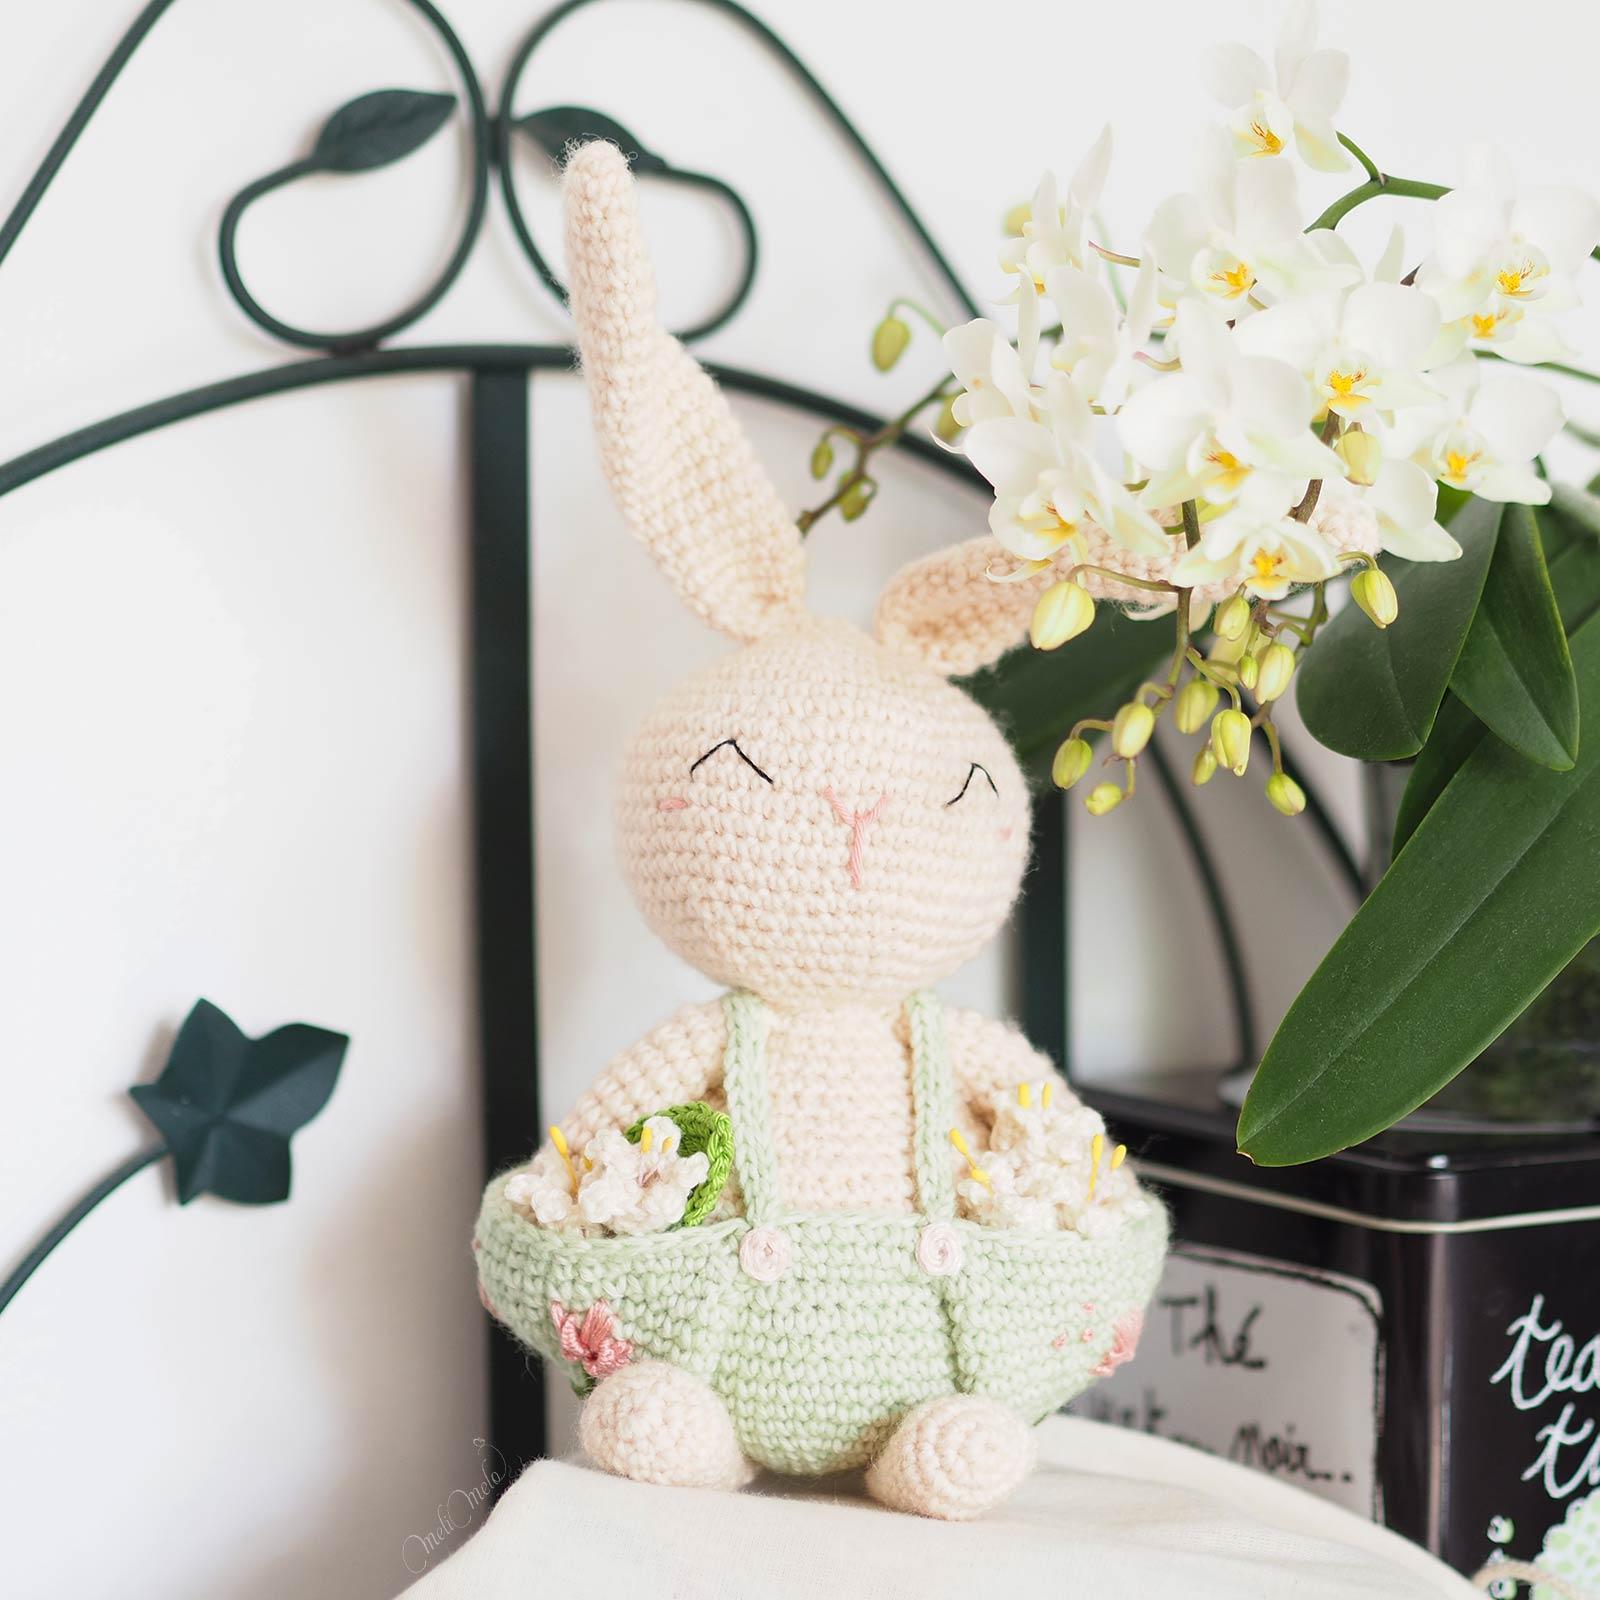 amigurumi-lapin-crochet-muguet-orchidee-laboutiquedemelimelo